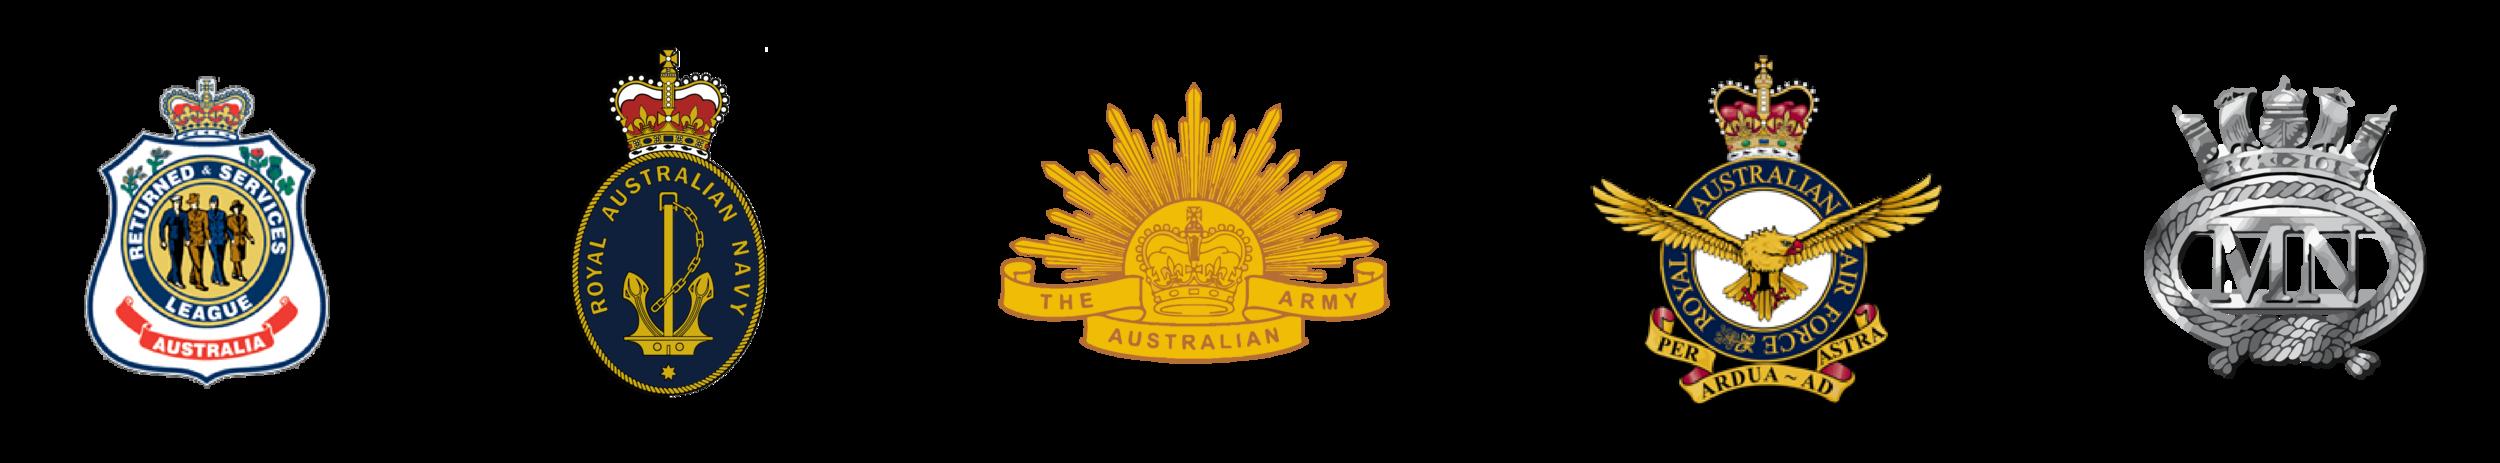 Sub Branch Logos-01.png